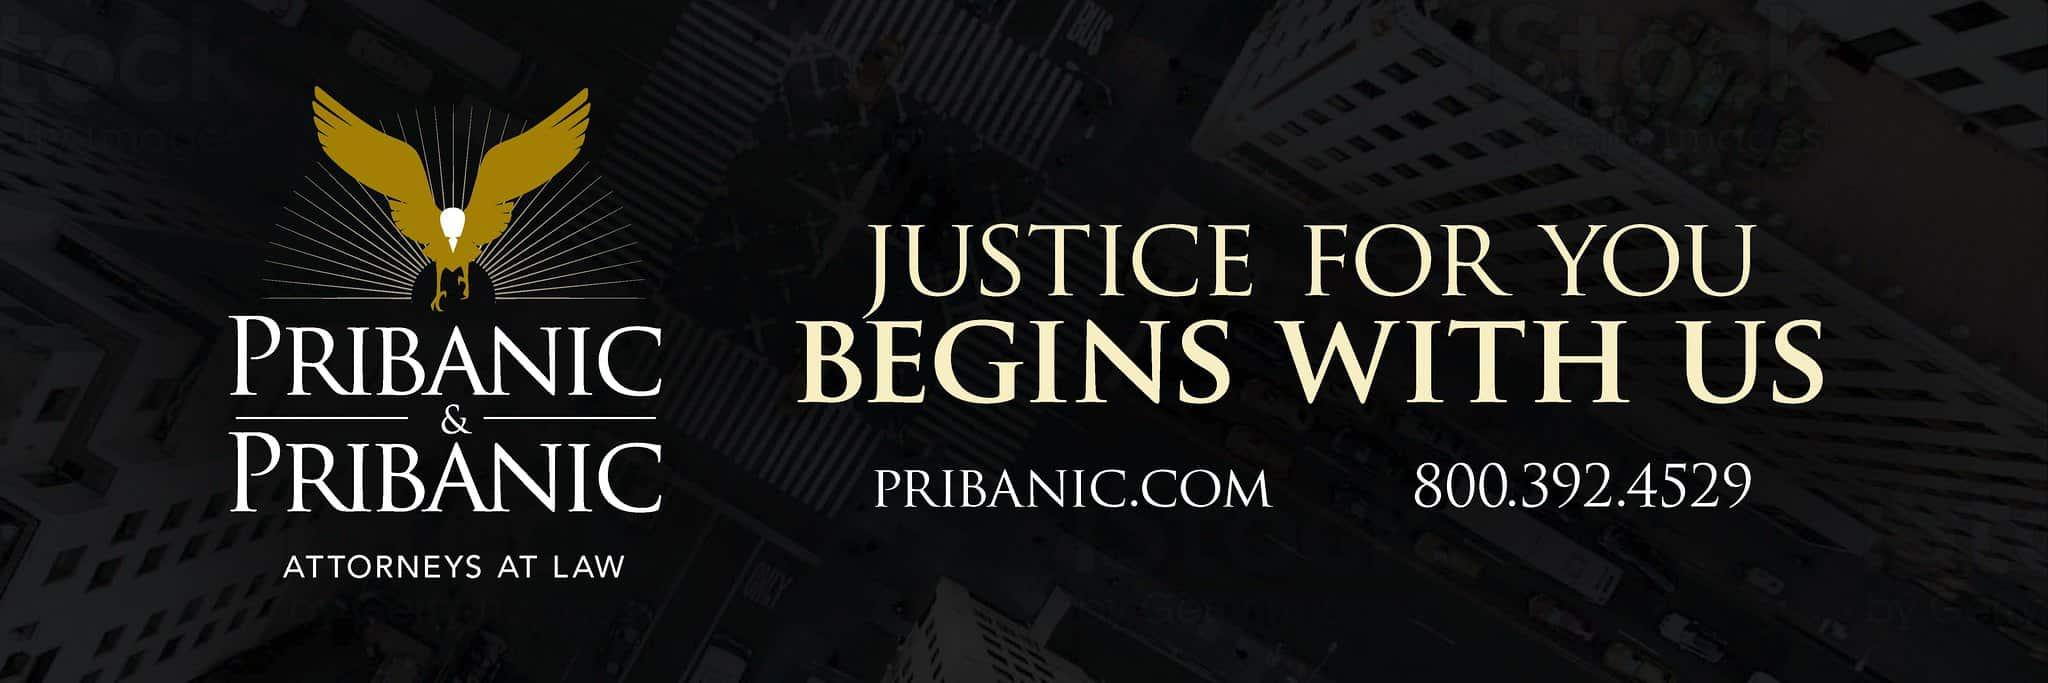 Pribanic & Pribanic Law Firm Story